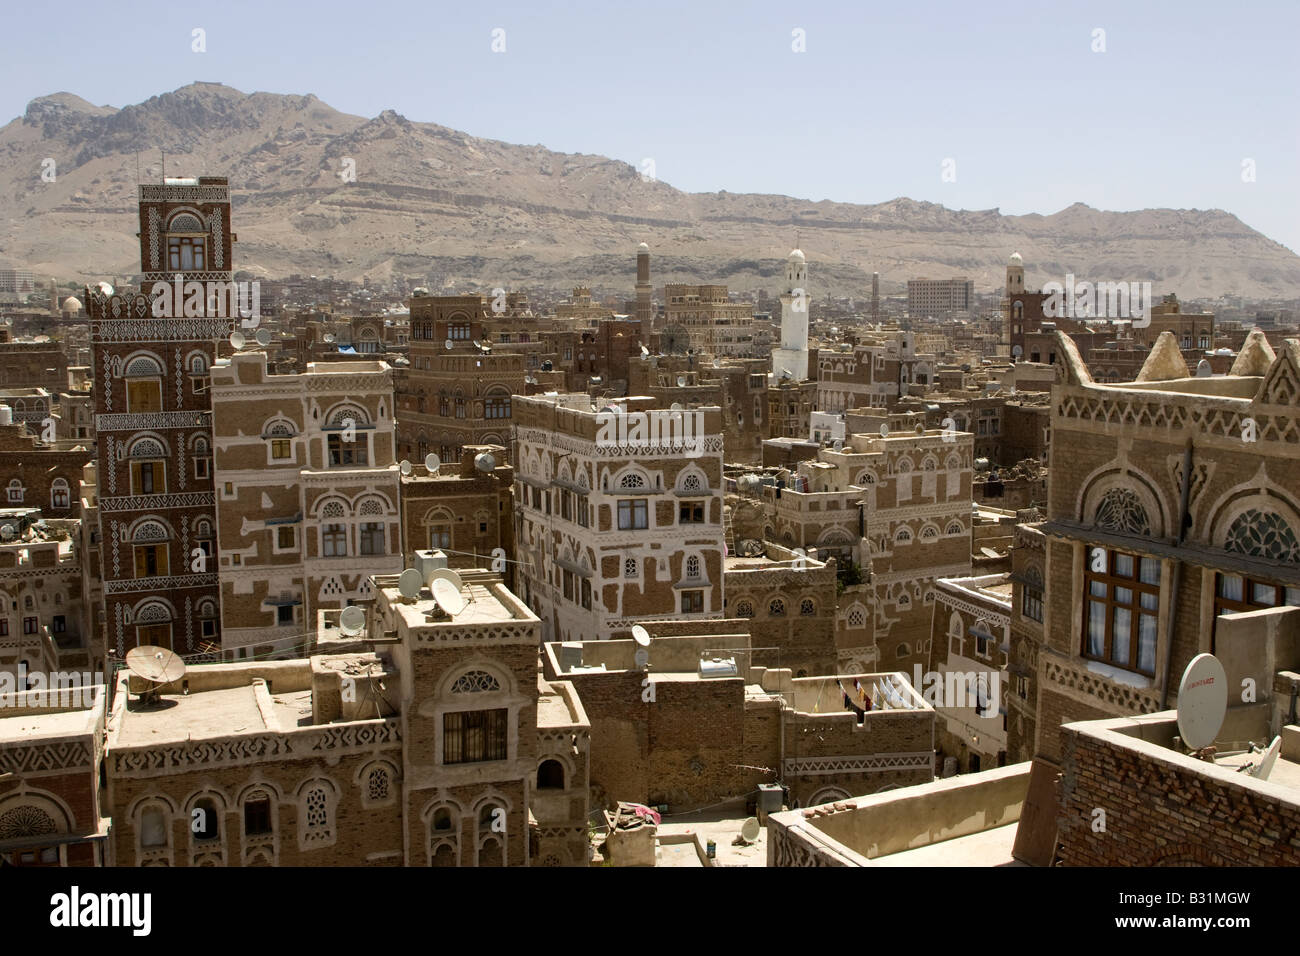 The ancient capital city of Yemen Sanaa - Stock Image